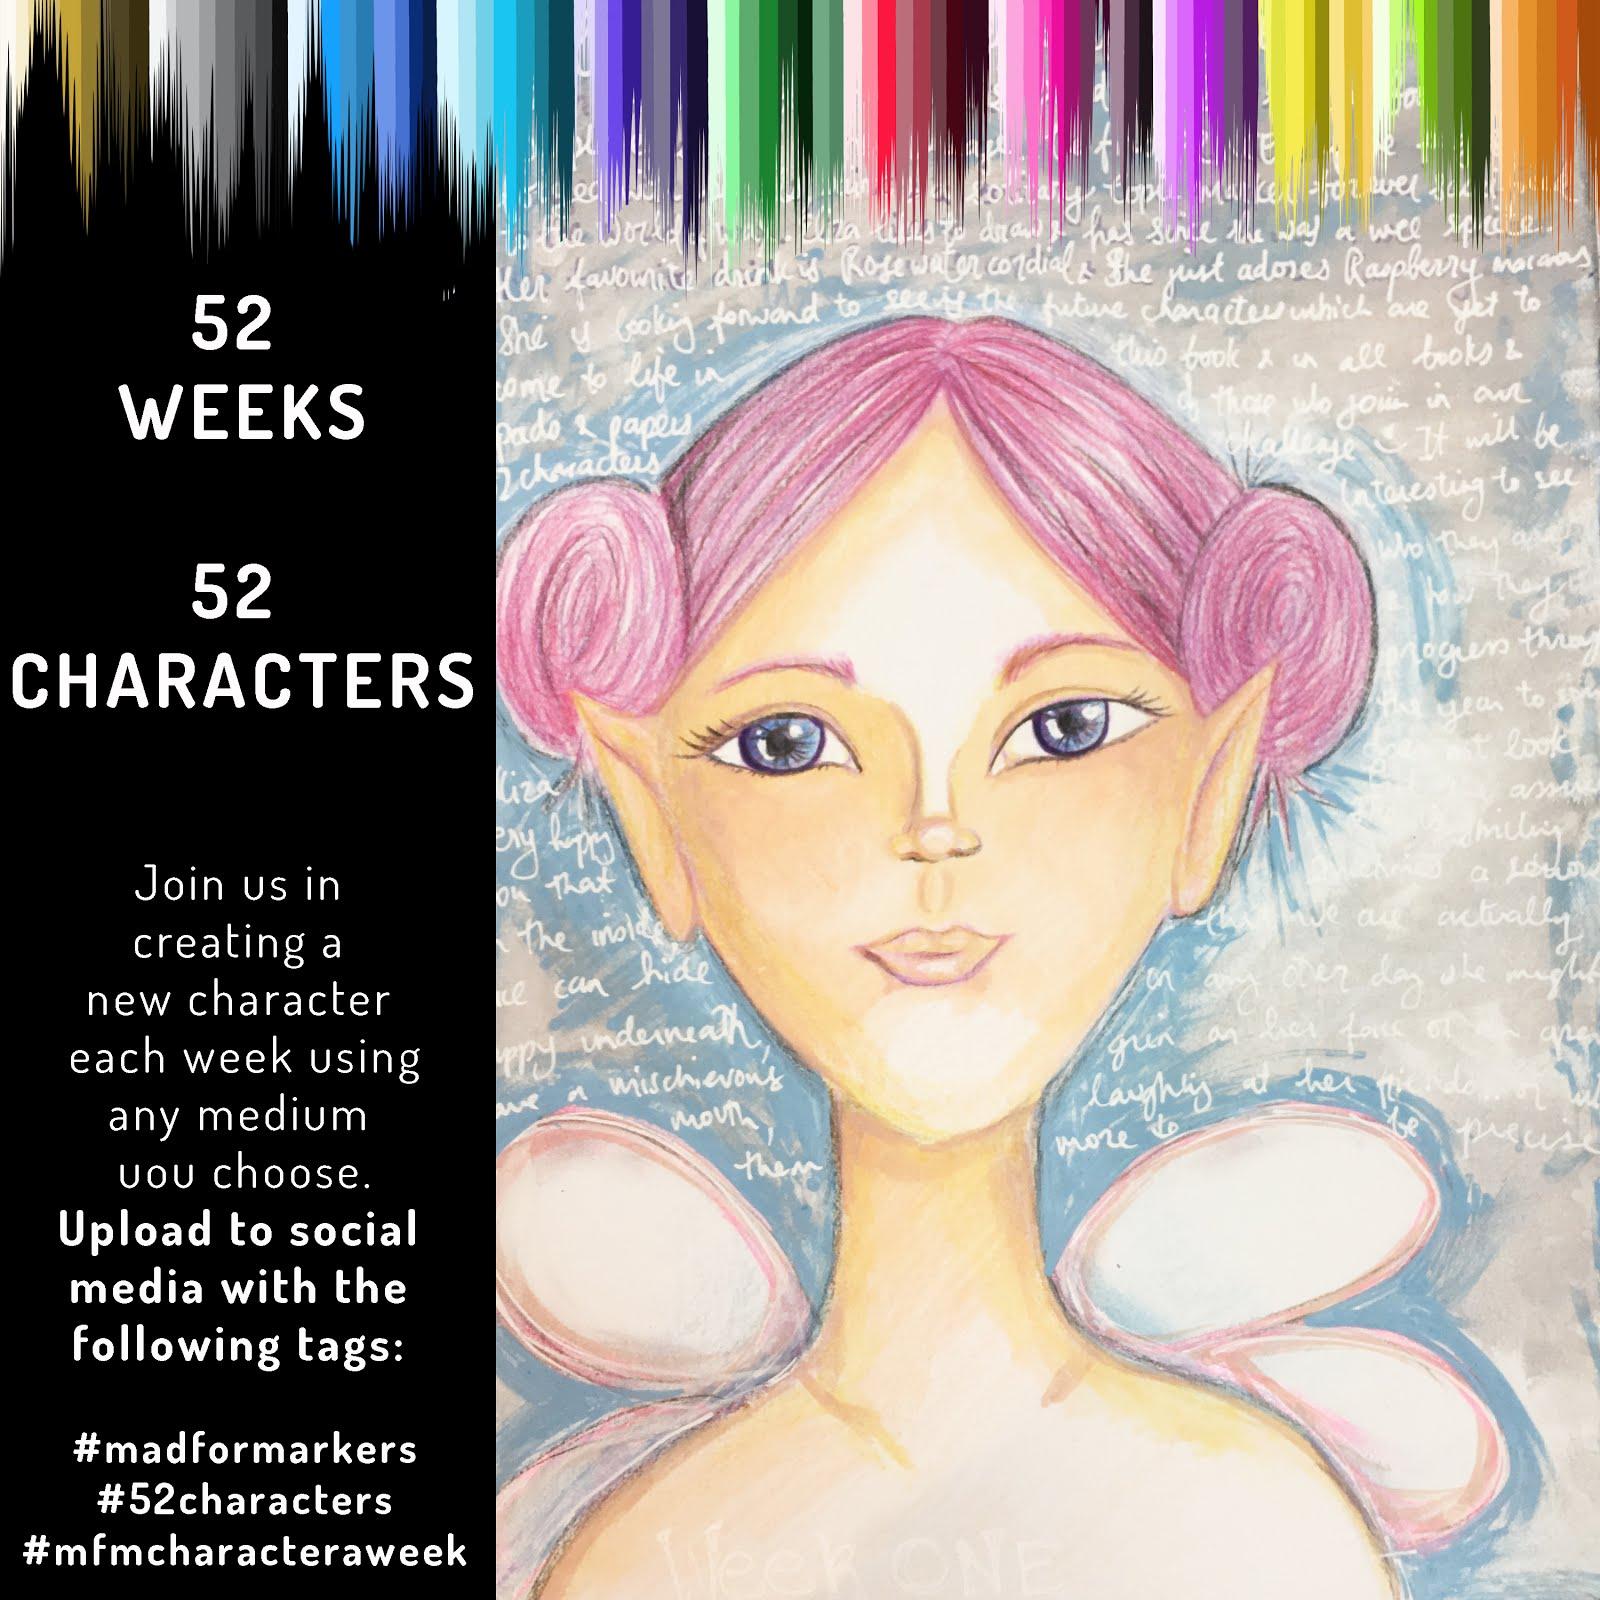 52 characters challenge